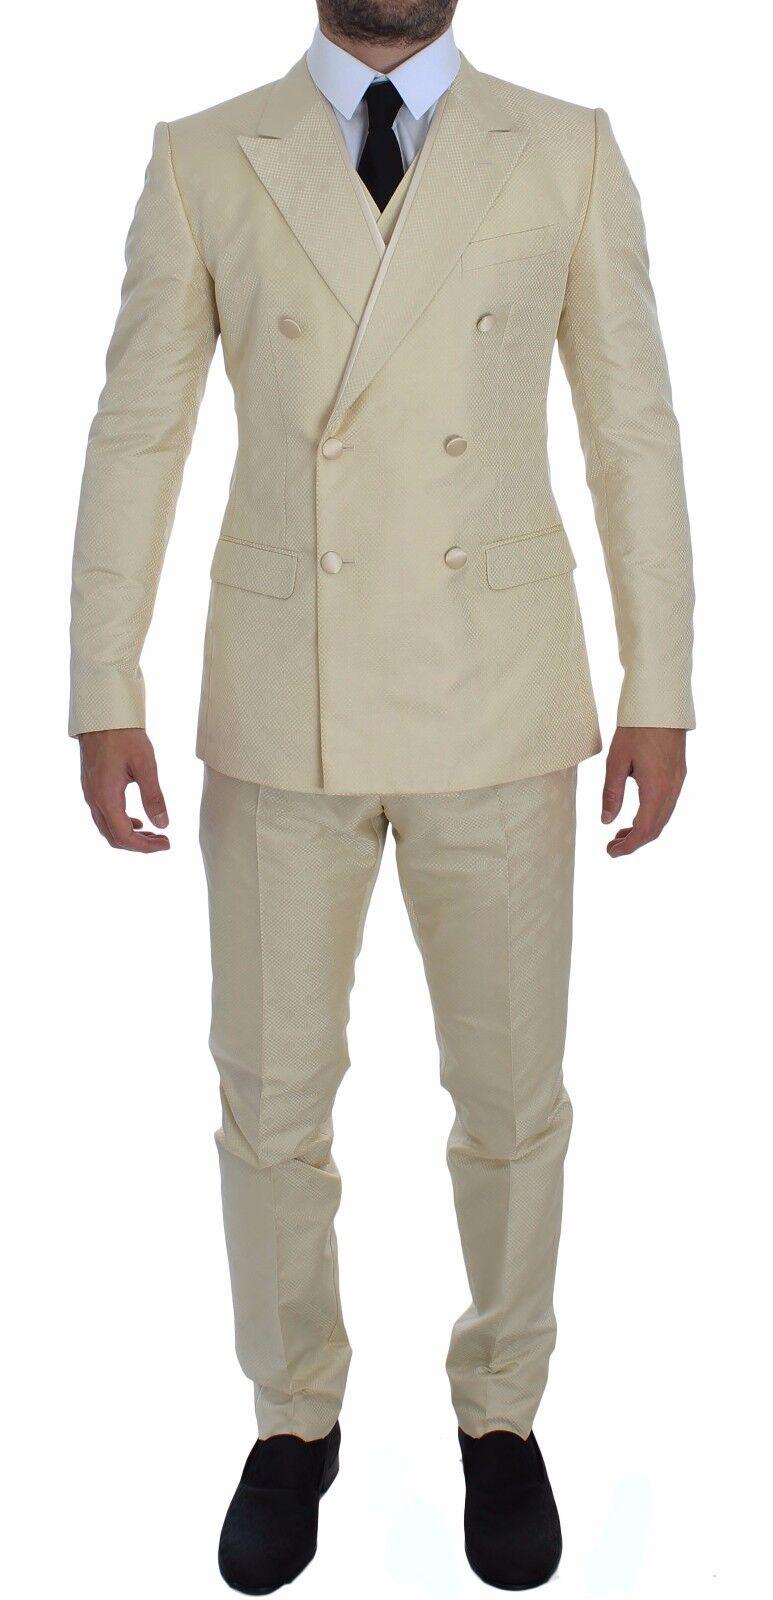 NWT DOLCE & GABBANA Cream Weiß Double Breasted 3 Piece Suit EU52 /US42/XL